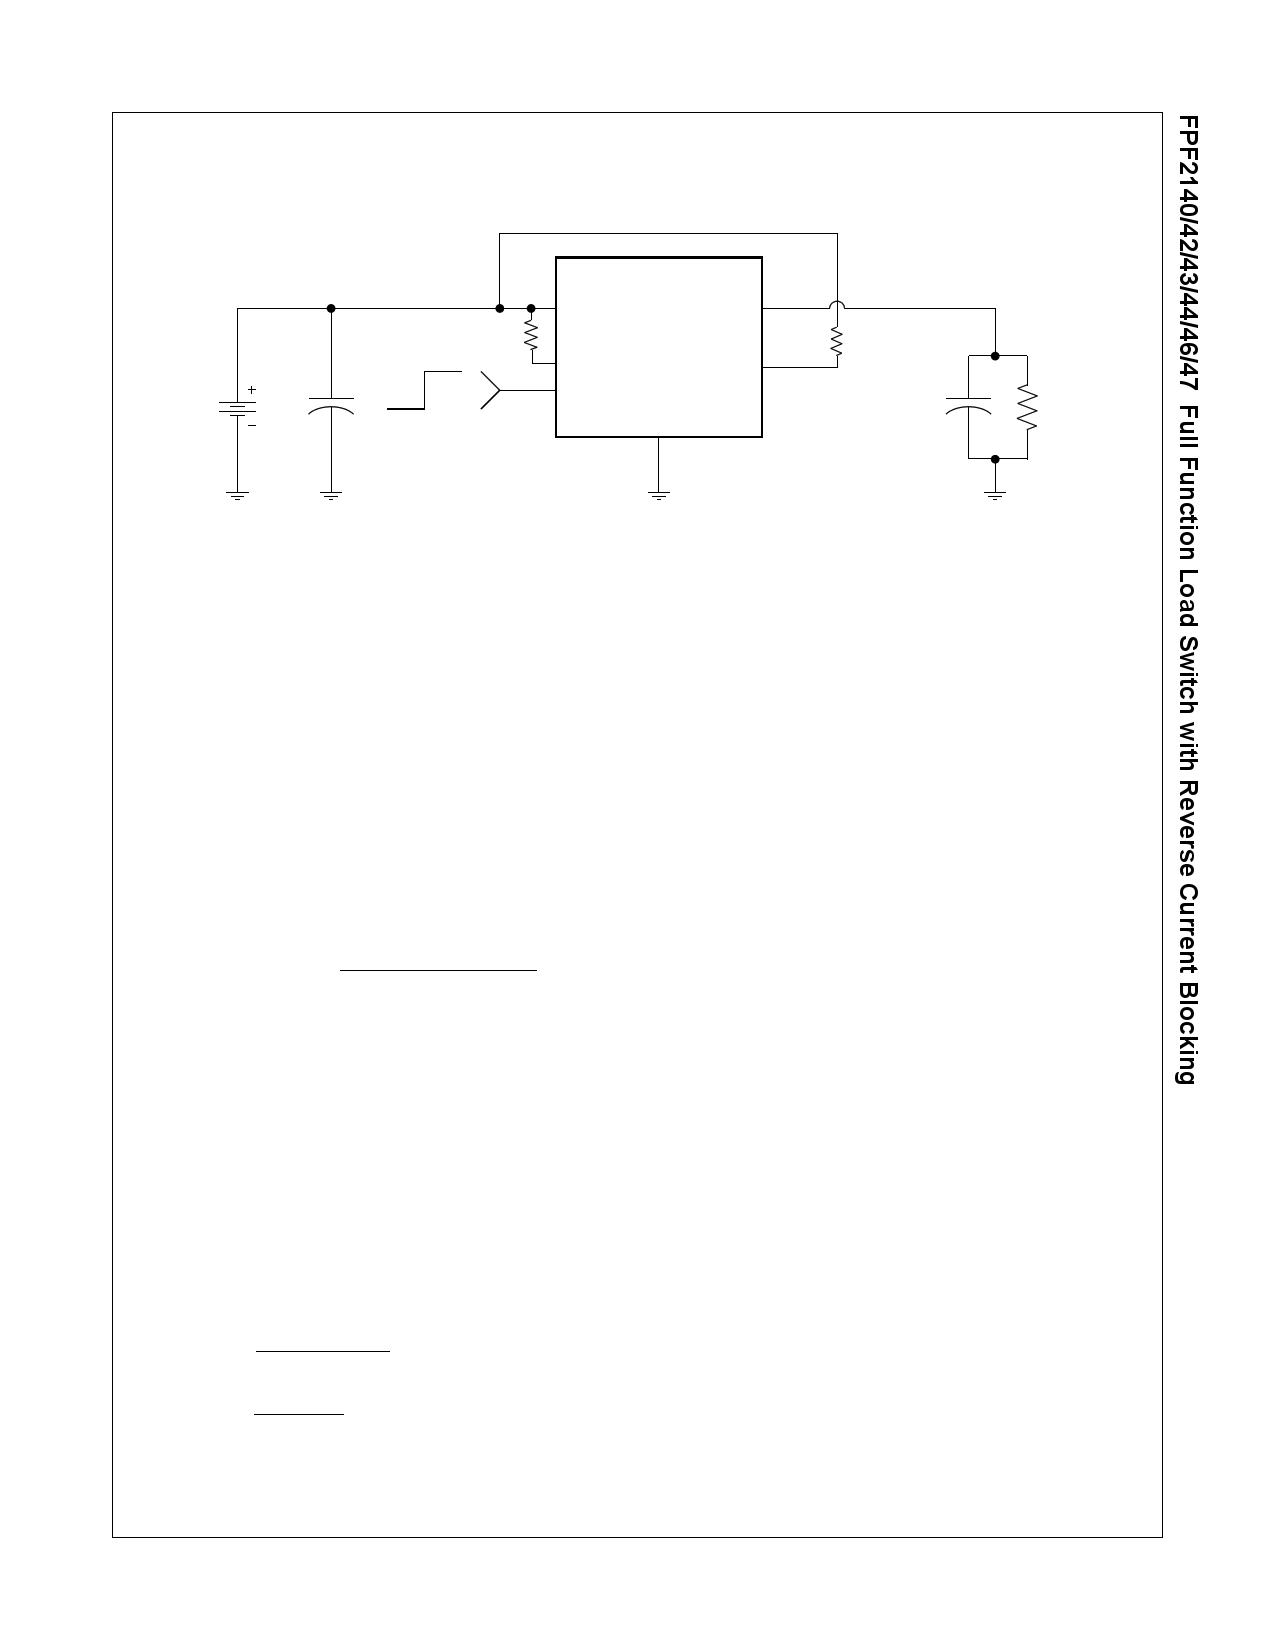 FPF2142 arduino